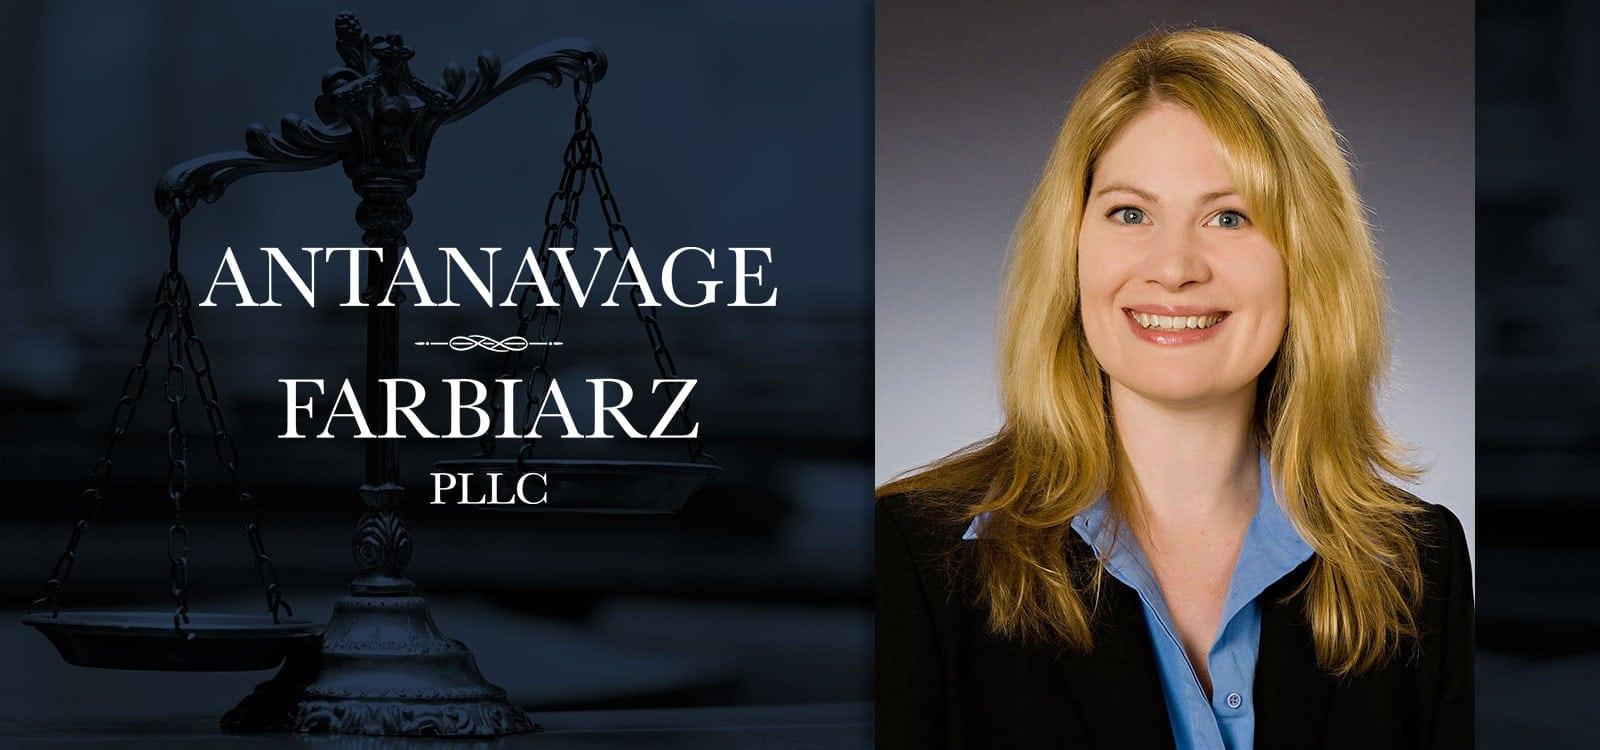 Alexa S  Antanavage, Partner | Antanavage Farbiarz, PLLC